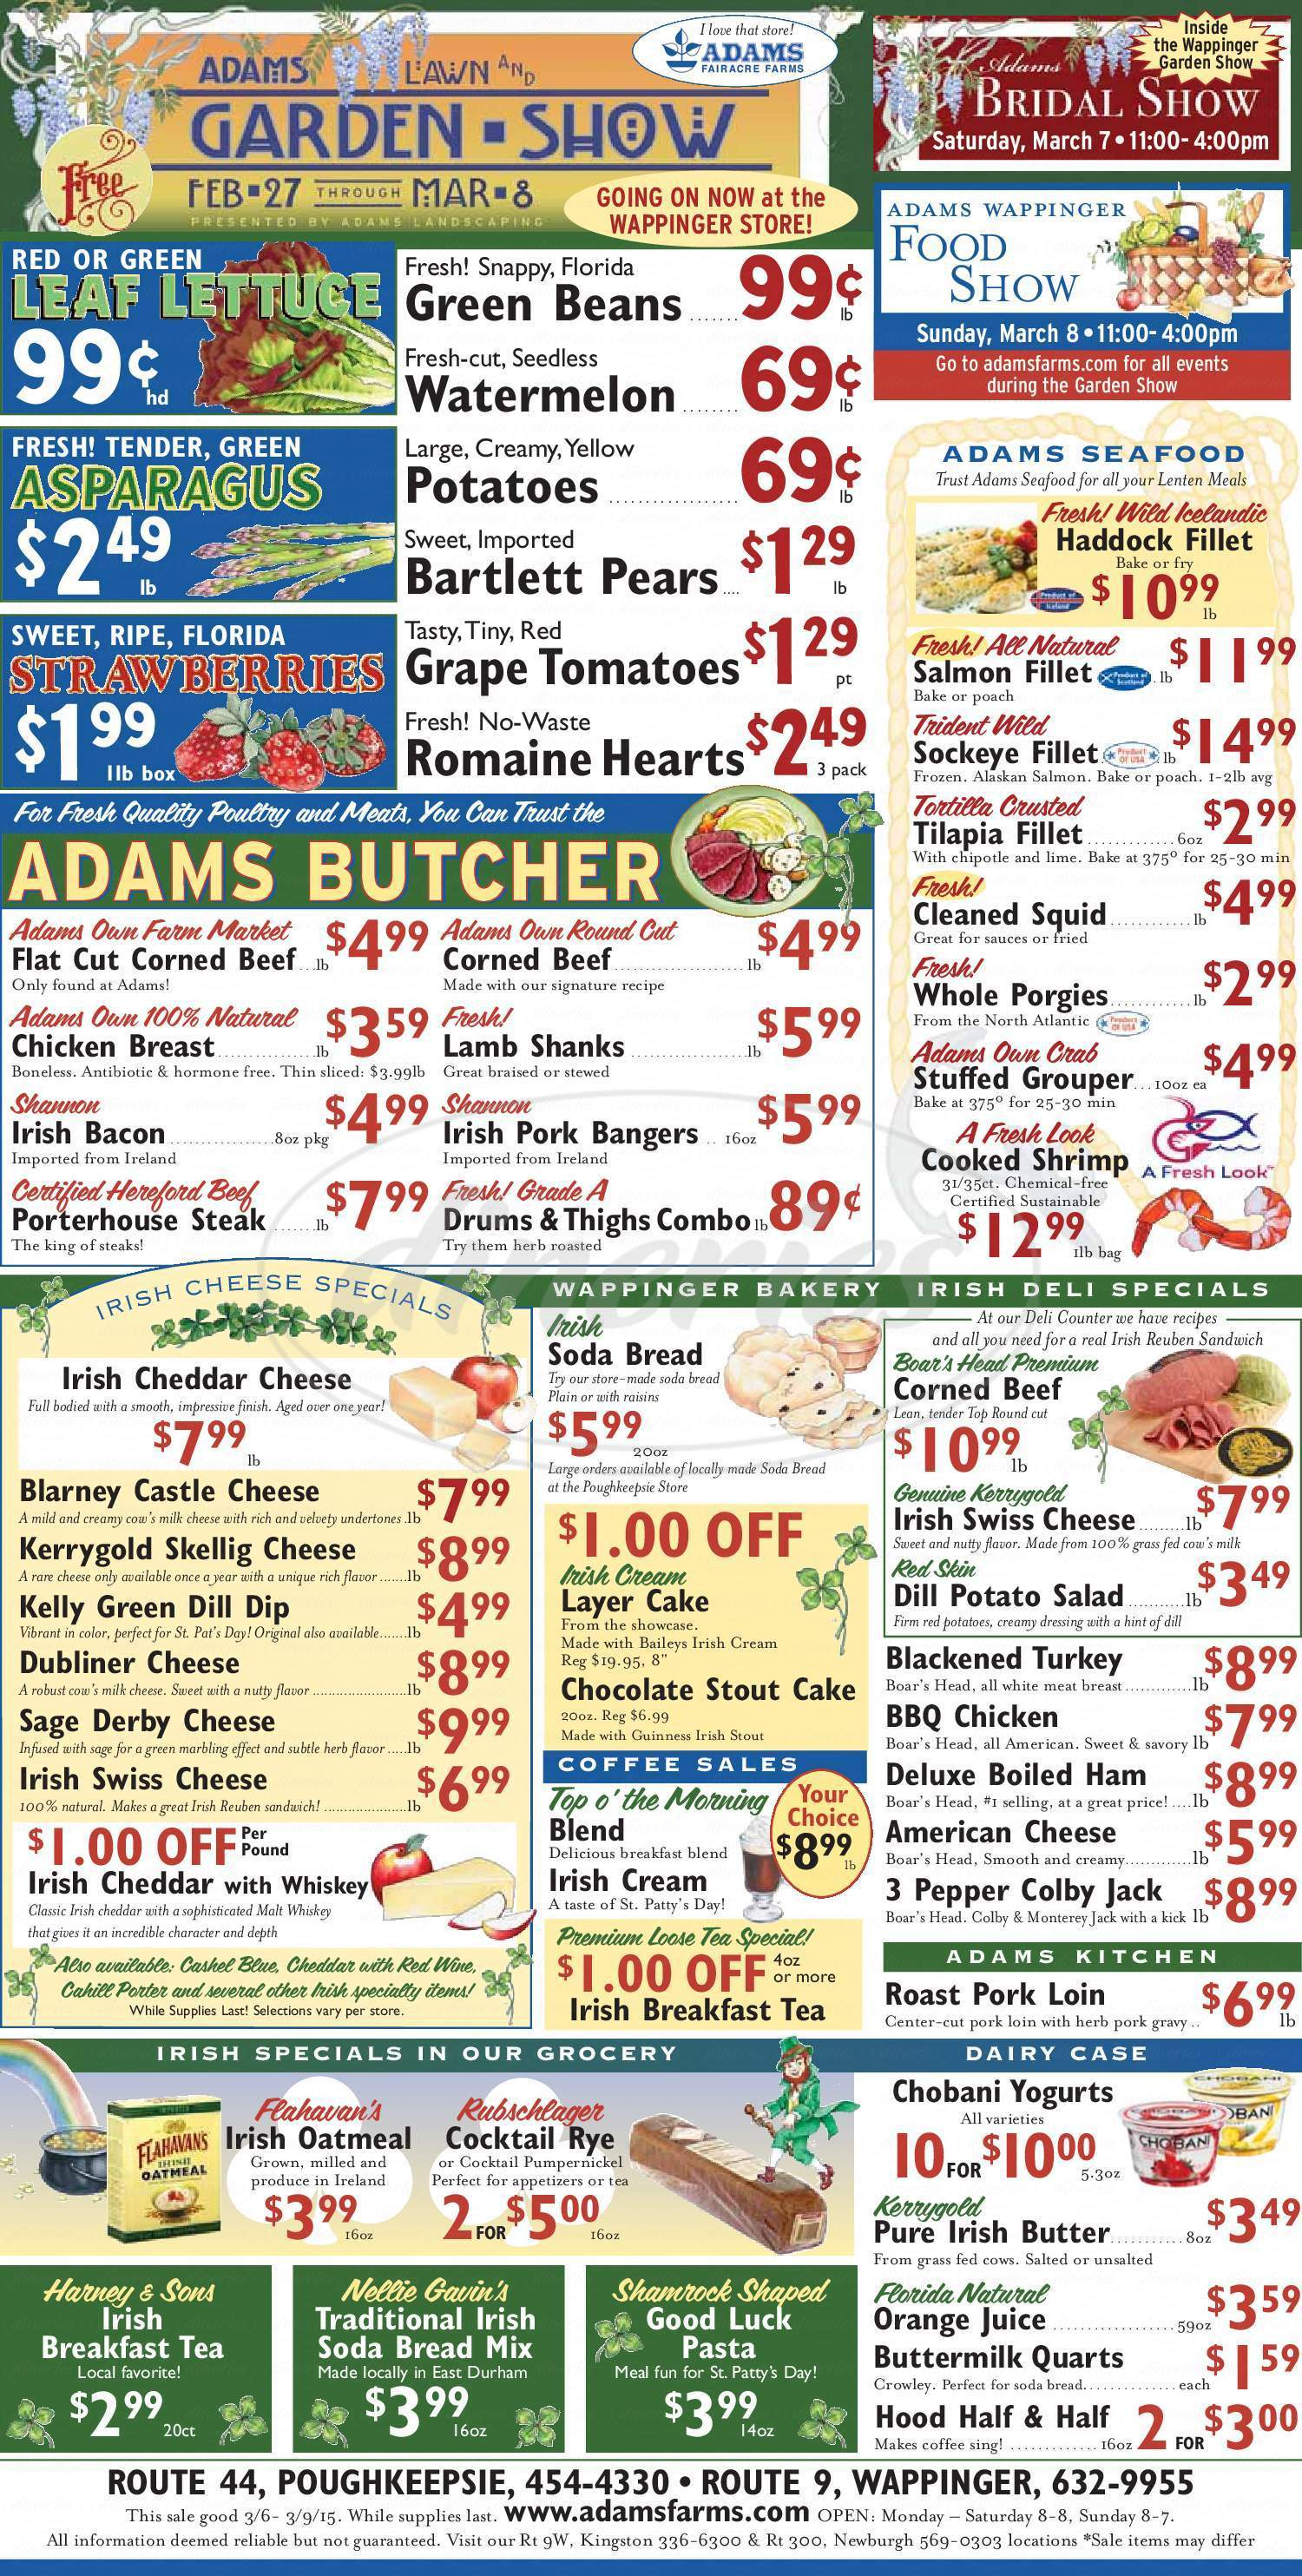 menu for Adams Cafe